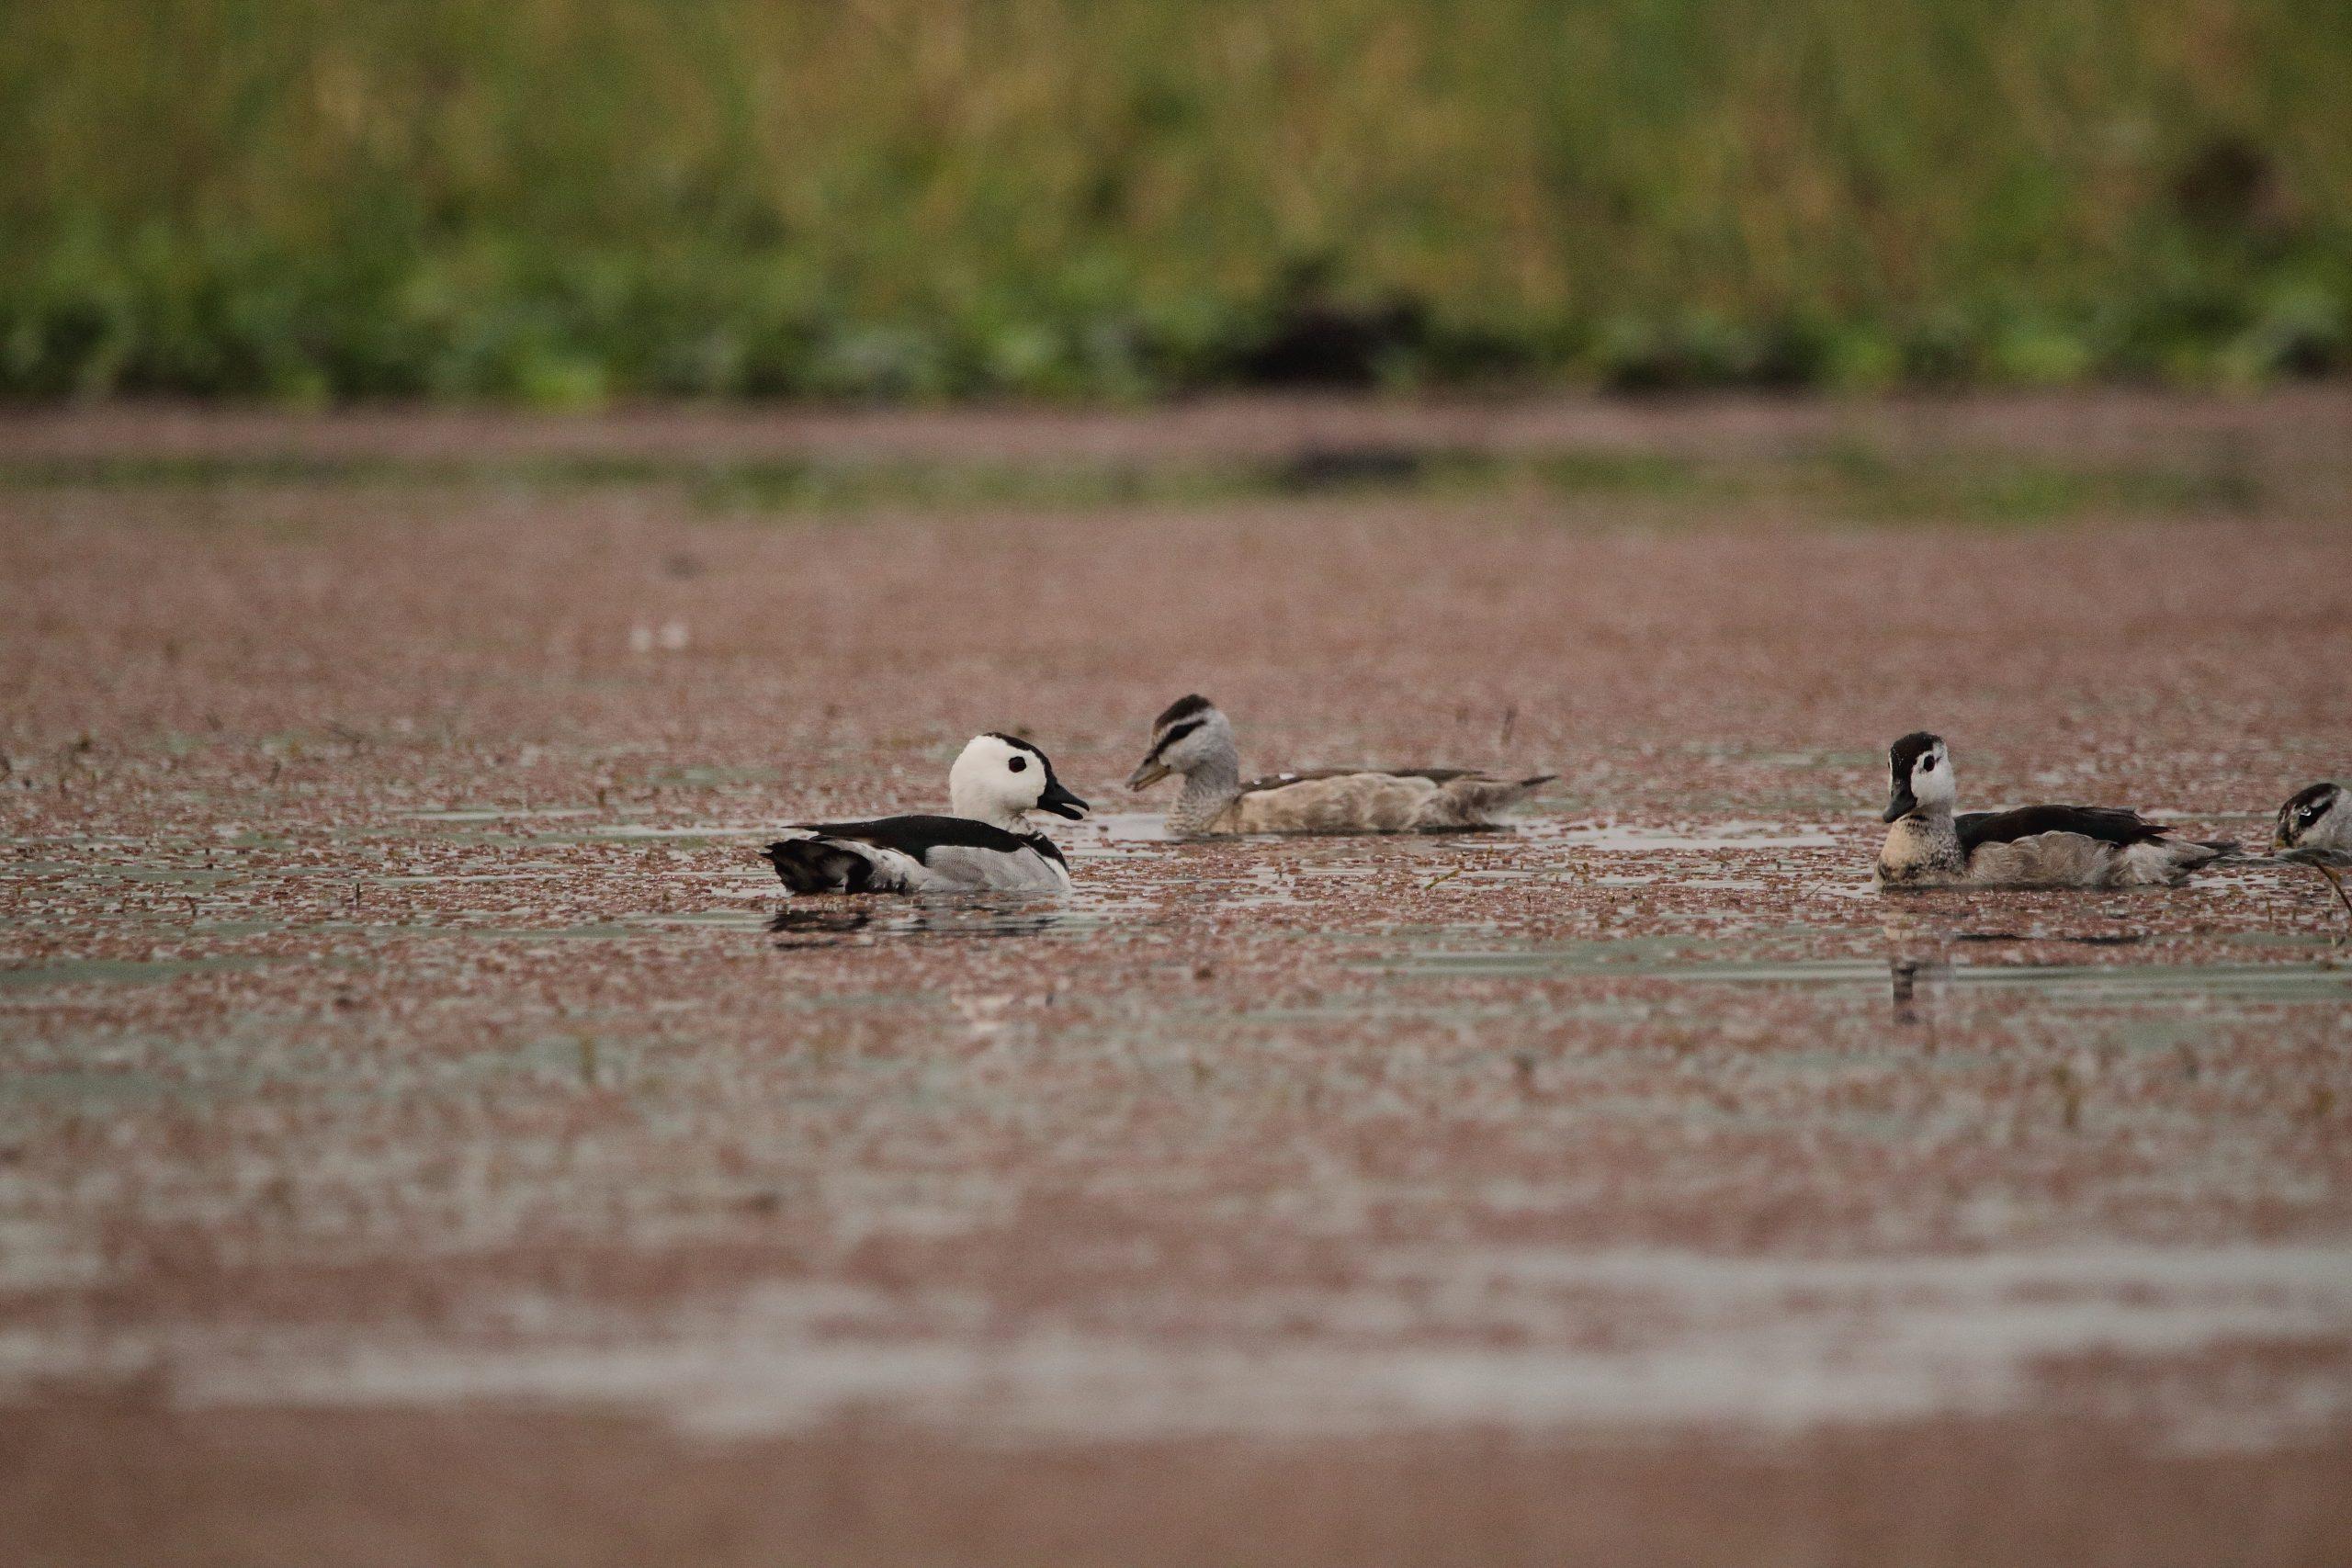 Cotton Teal/Cotton Pygmy-goose